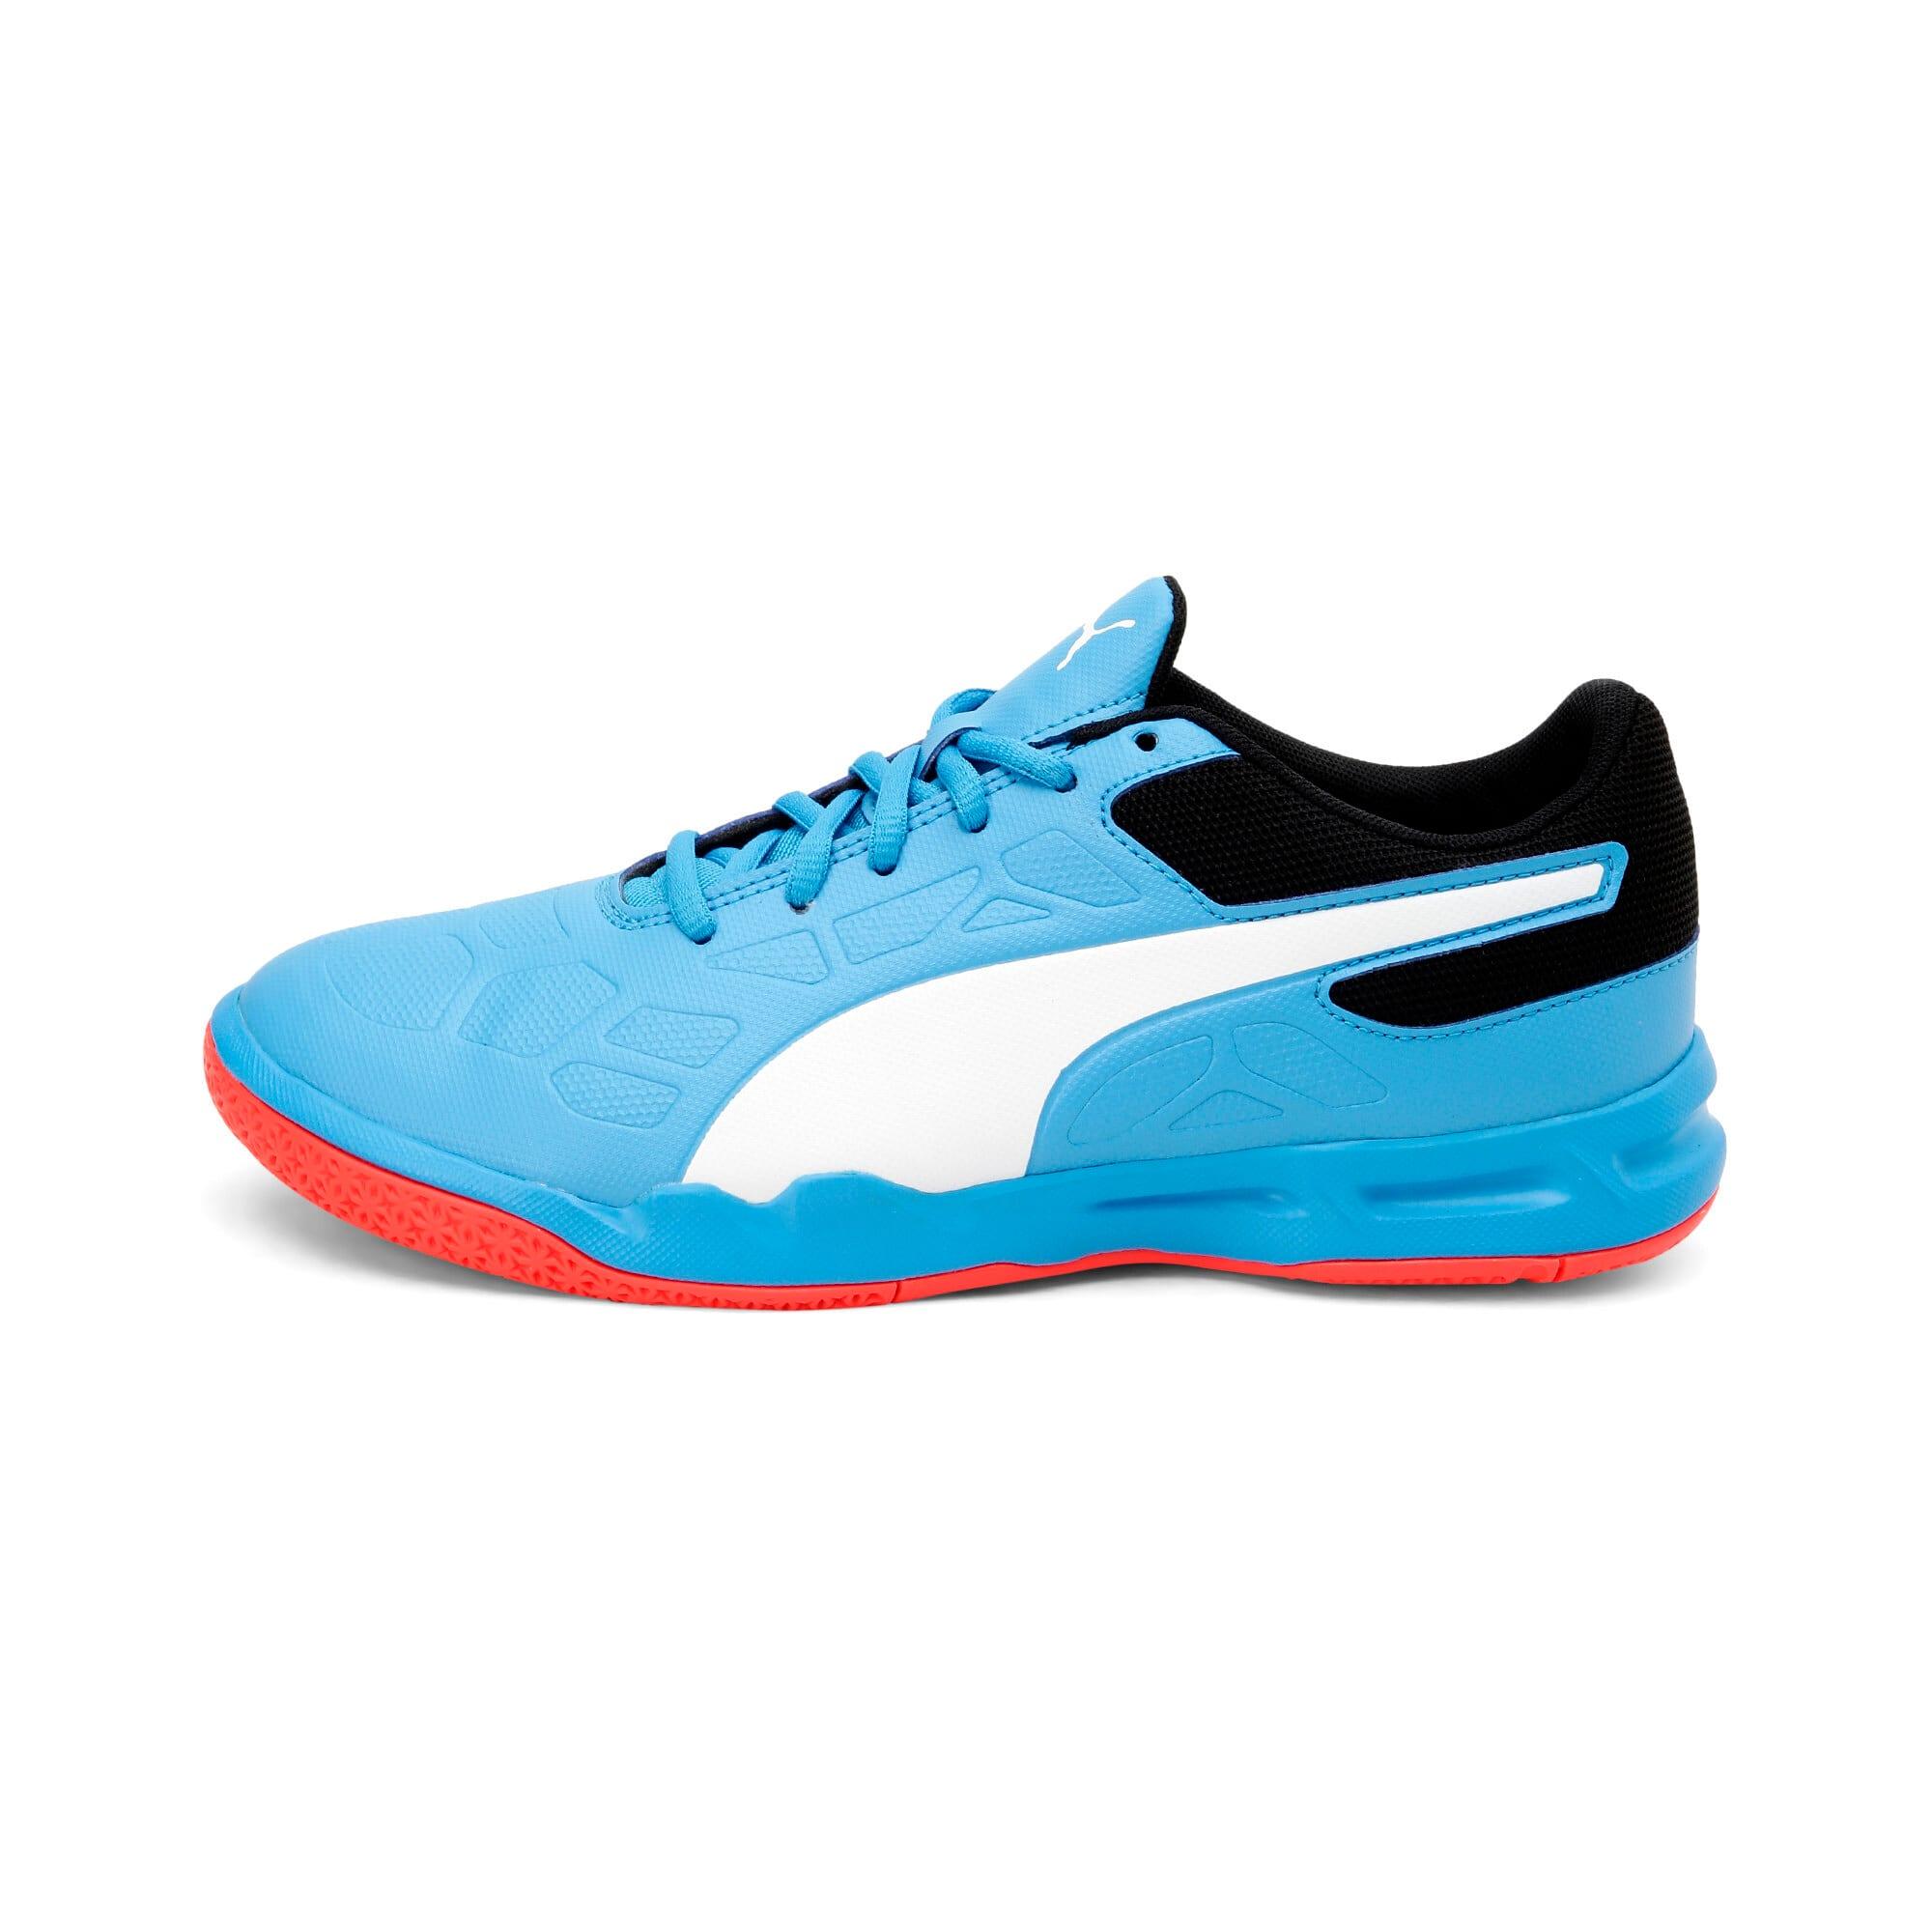 Thumbnail 1 of Tenaz Kids' Indoor Teamsport Shoes, Bleu Azur-White-Black-Red, medium-IND